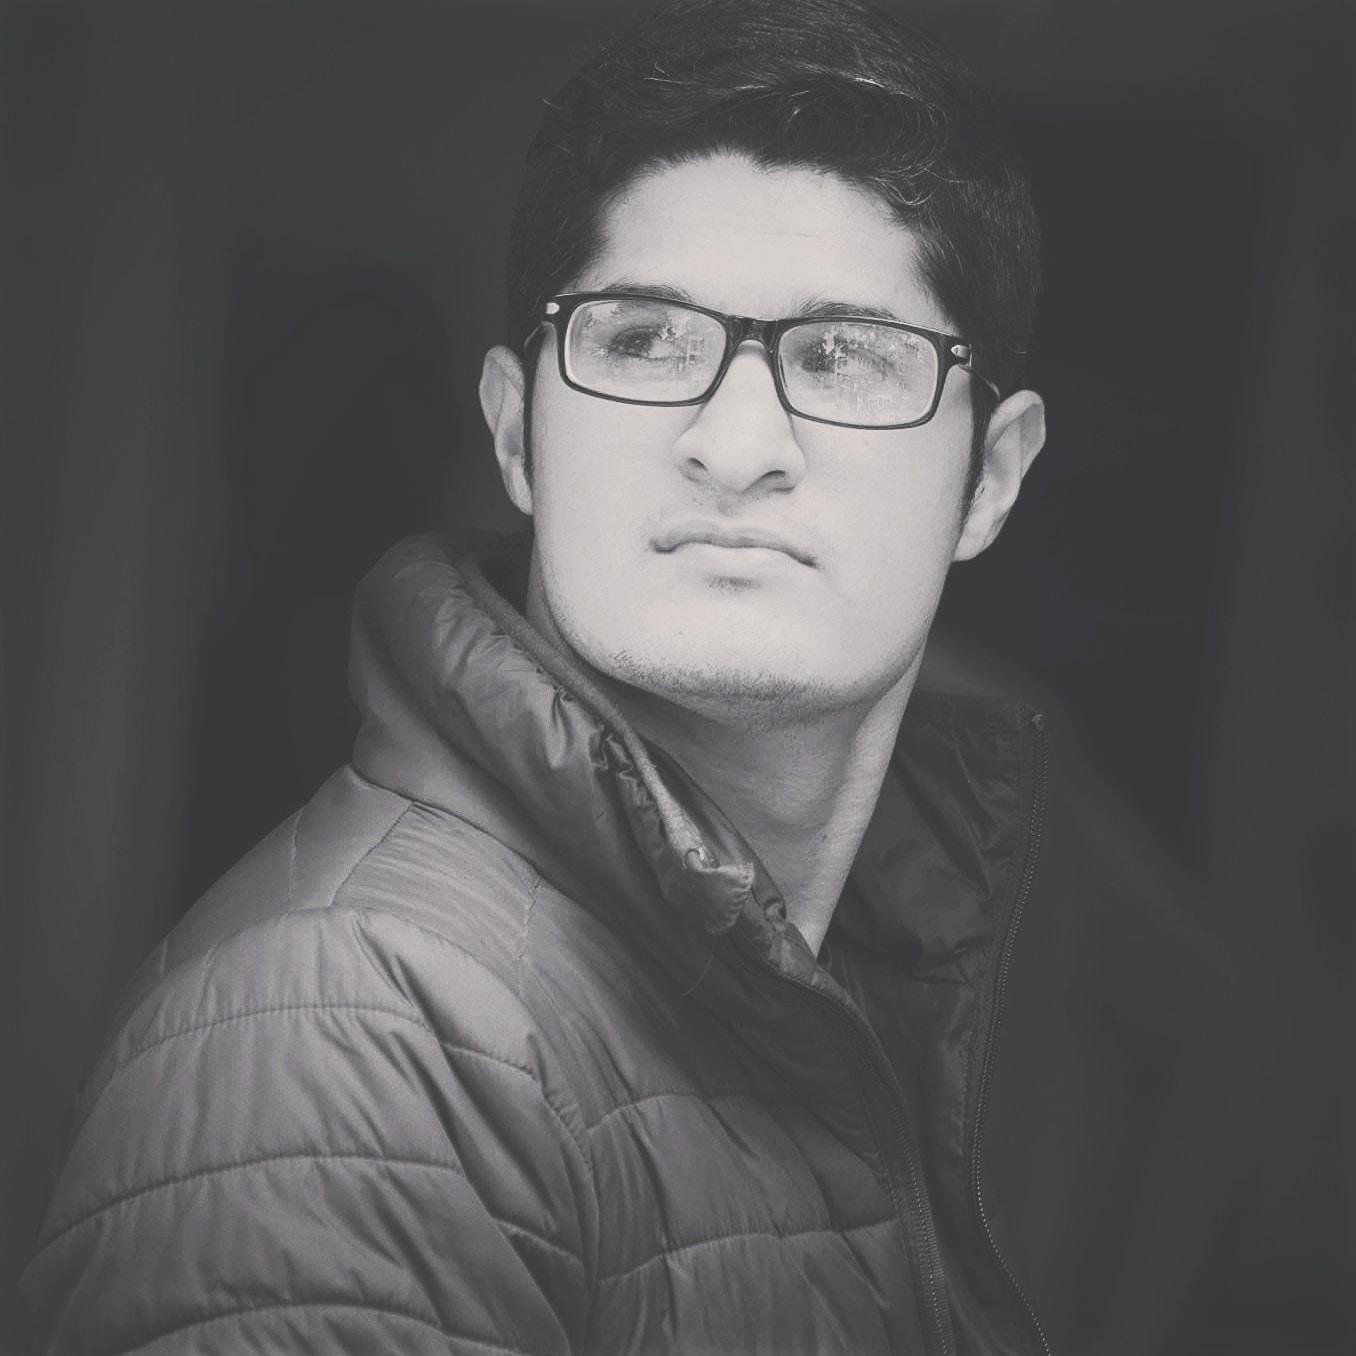 Go to Muhammad Shahzad's profile